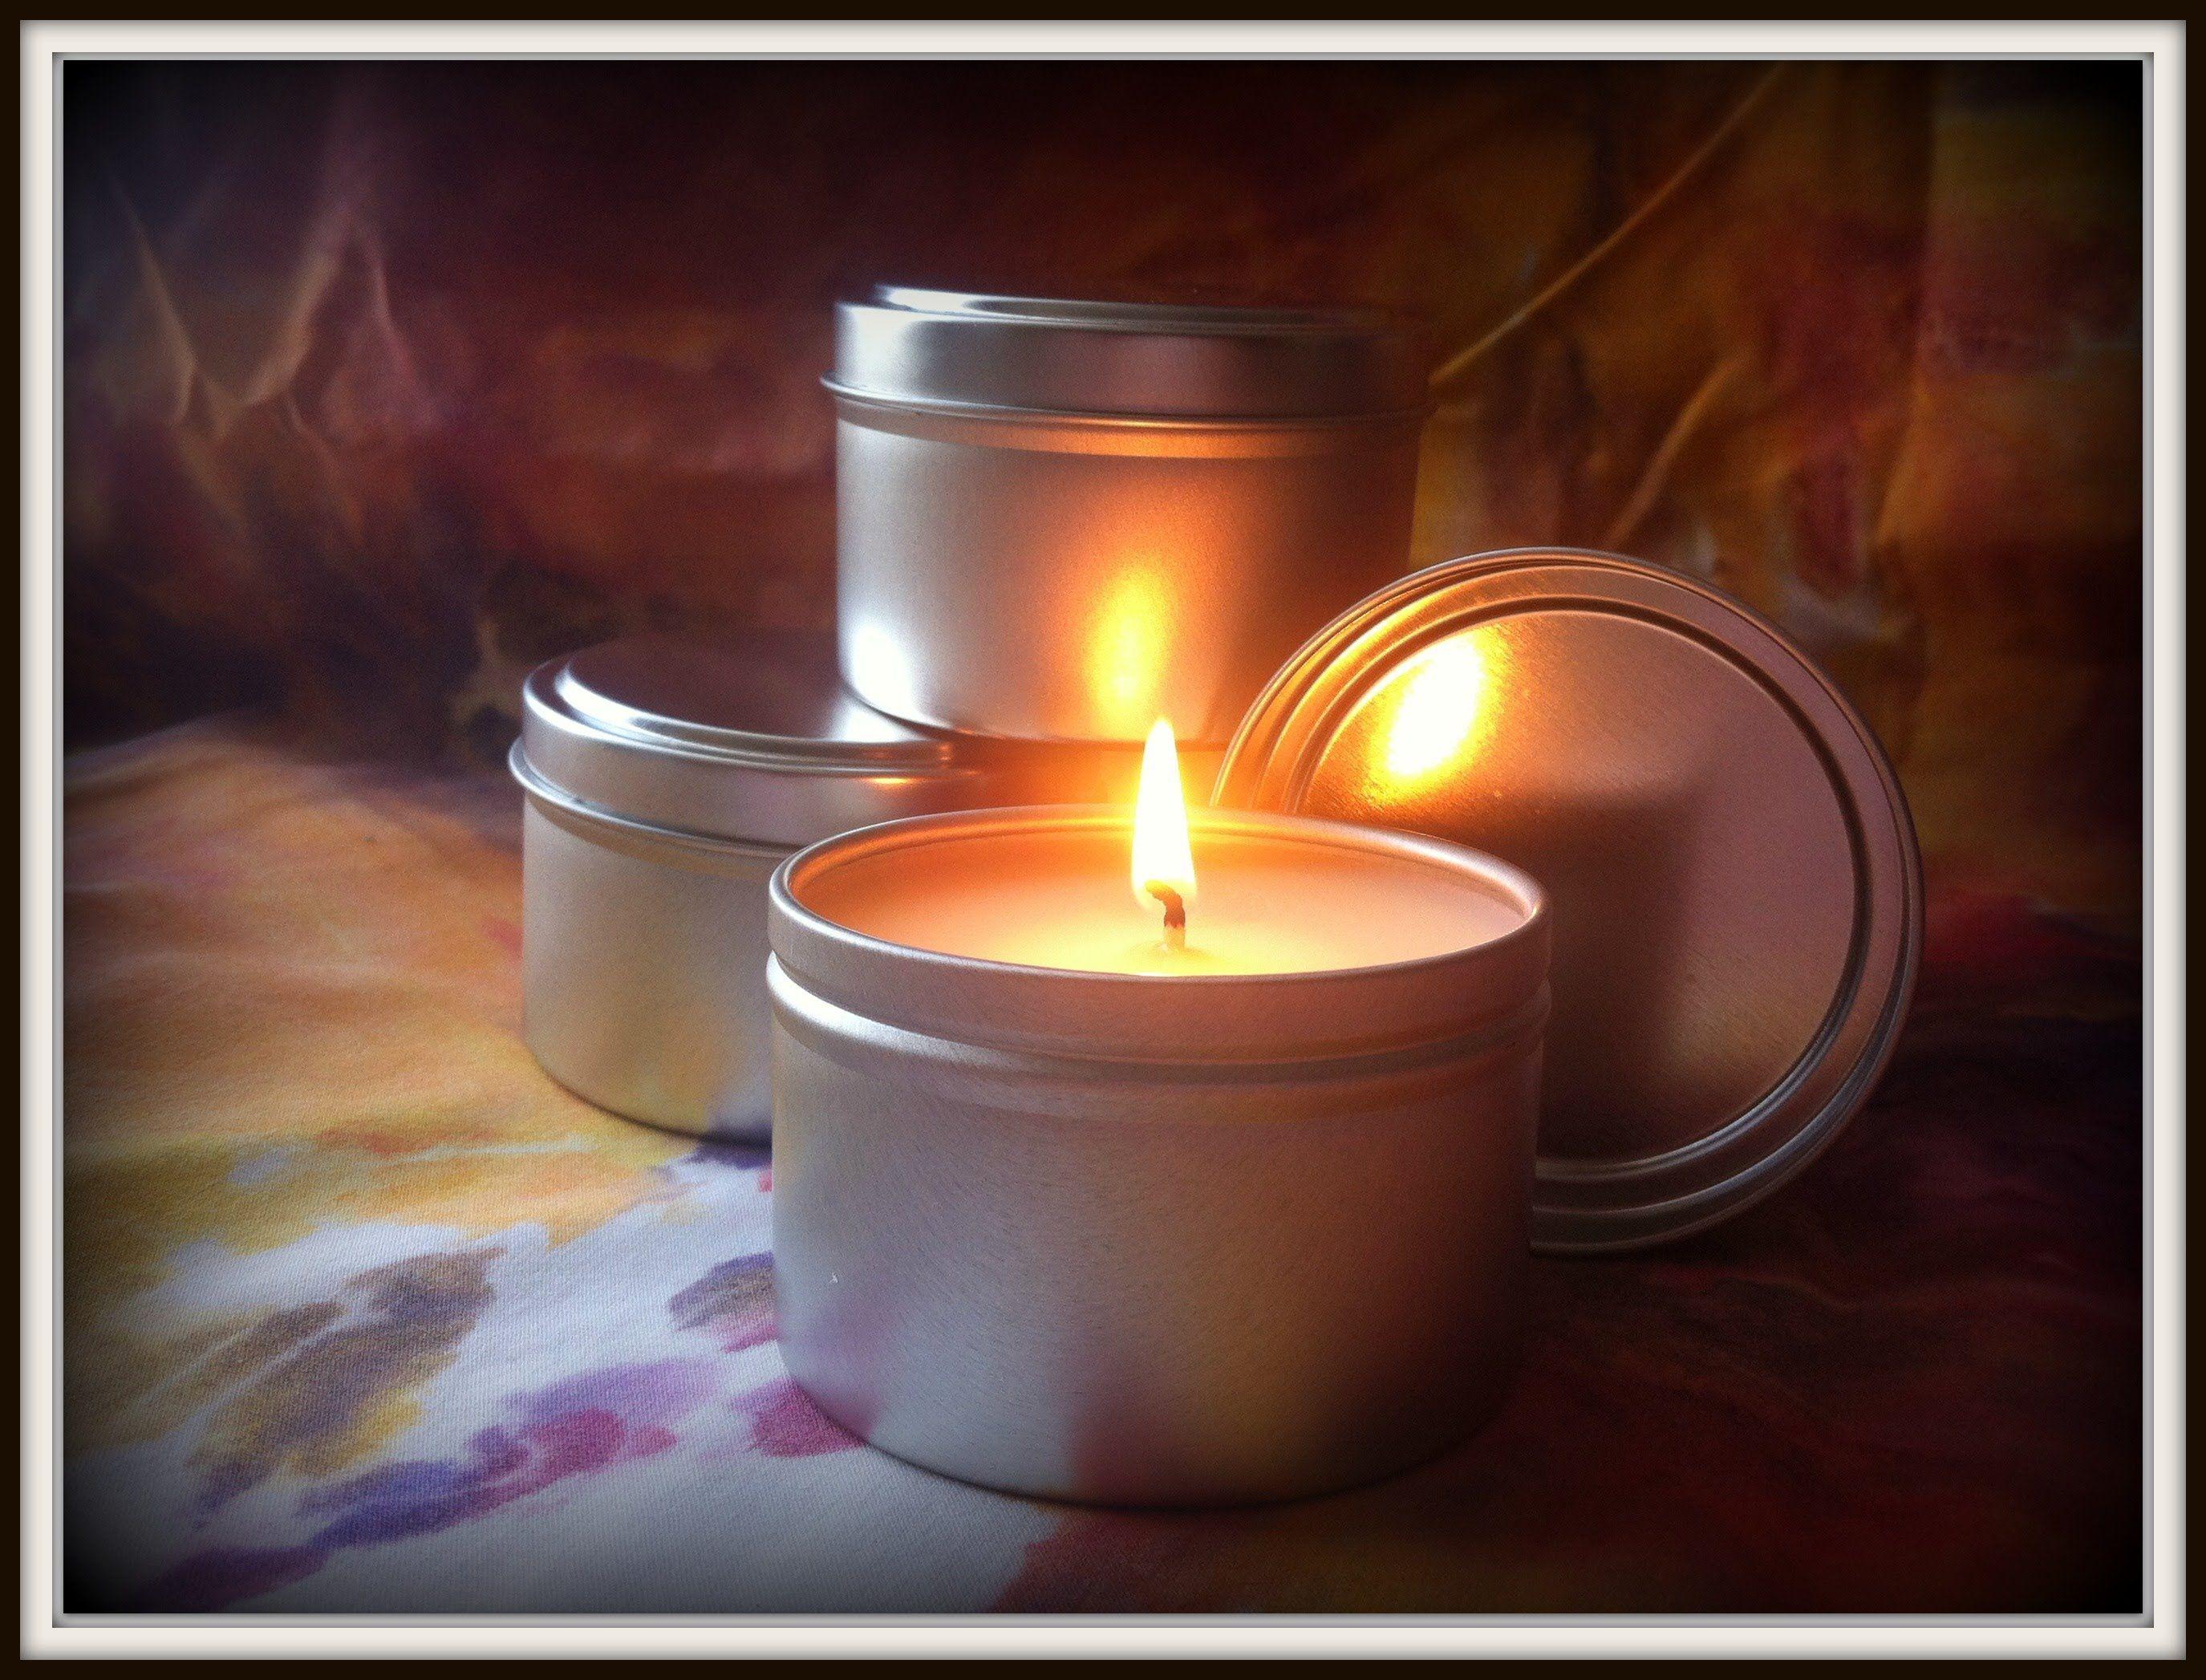 Making Massage Candles | Lotion candles, Massage candle, Massage candle  recipe